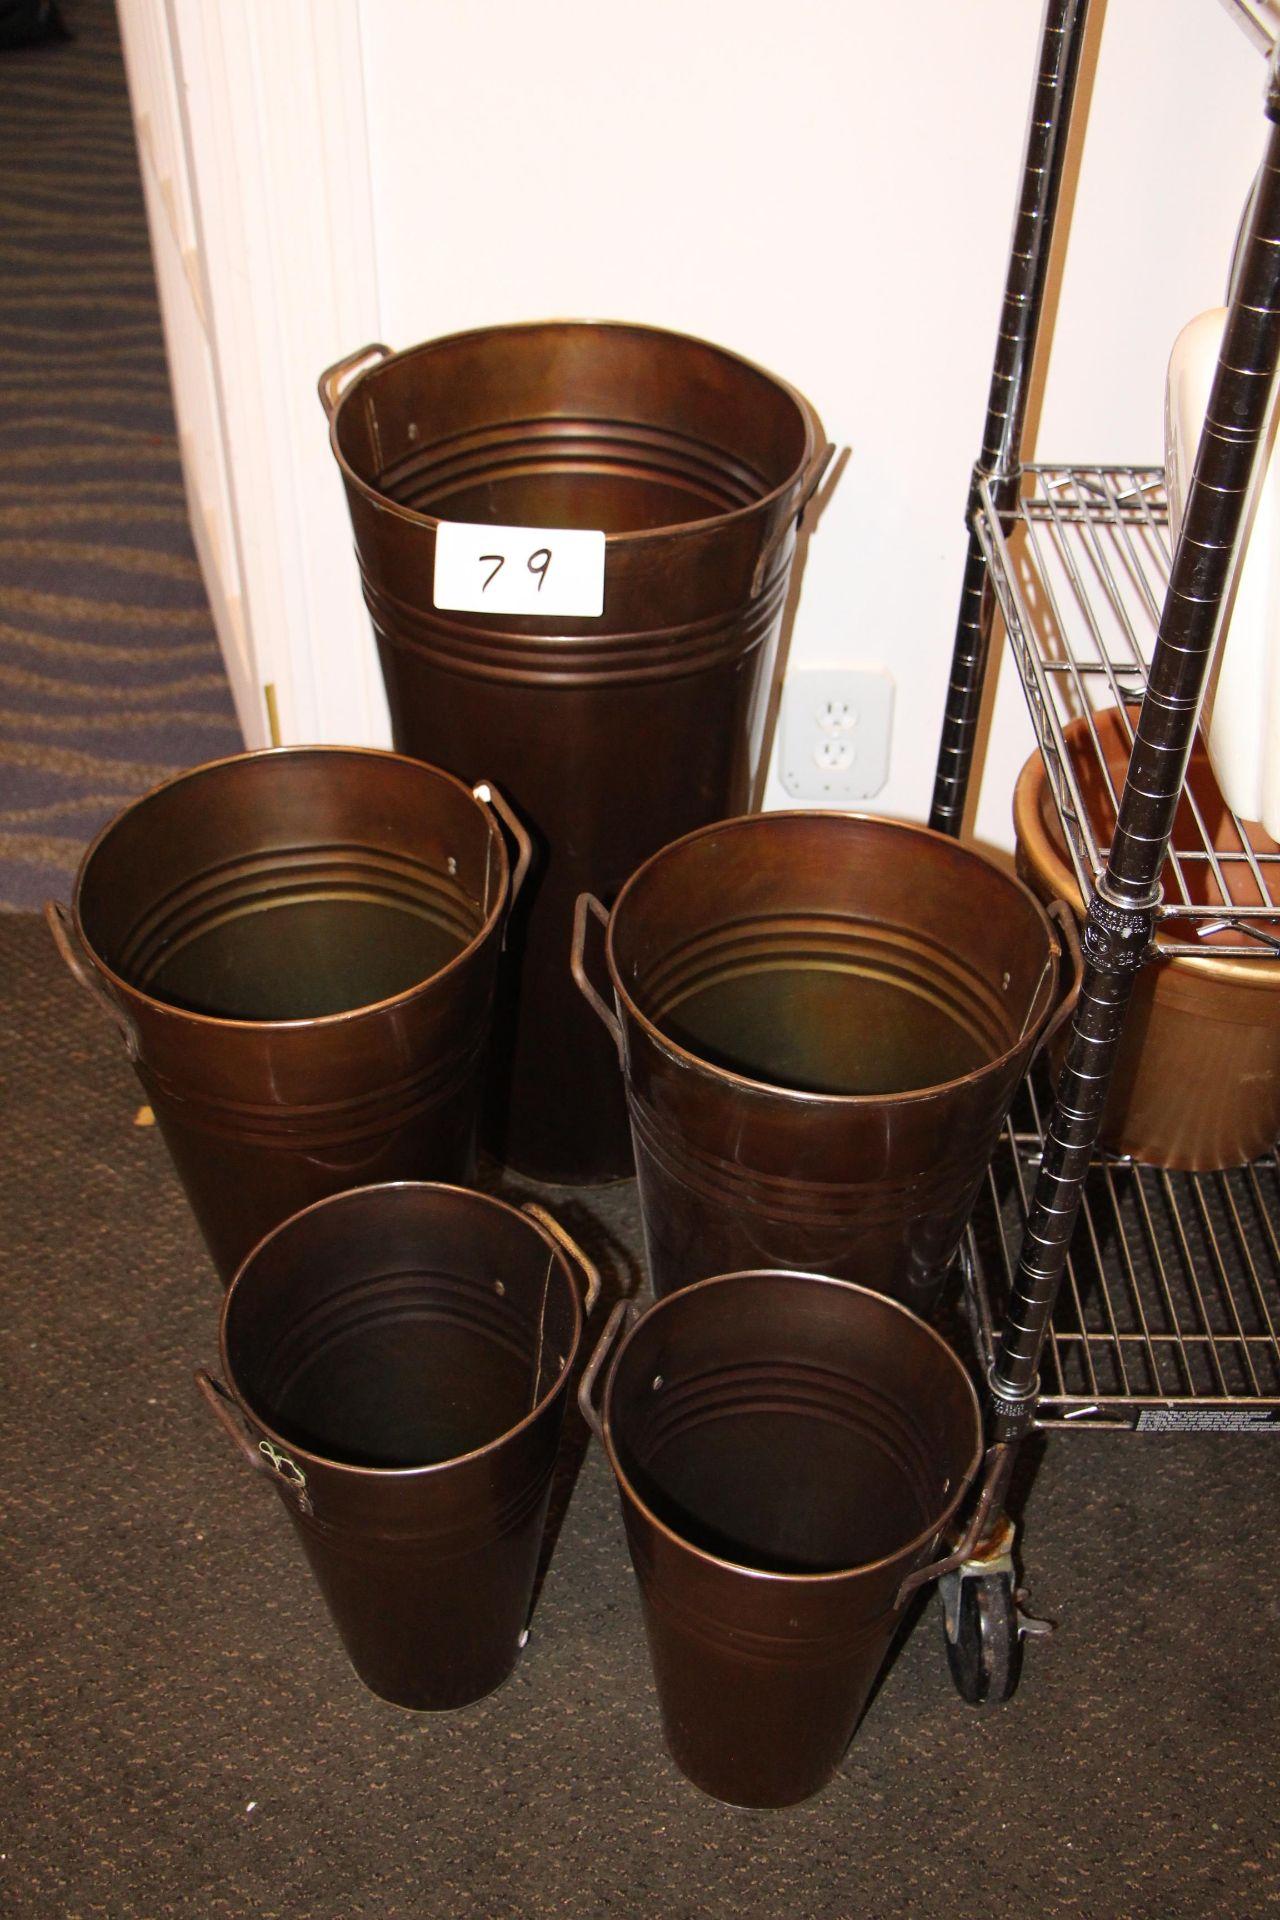 Lot 79 - Lot 5 tin cans